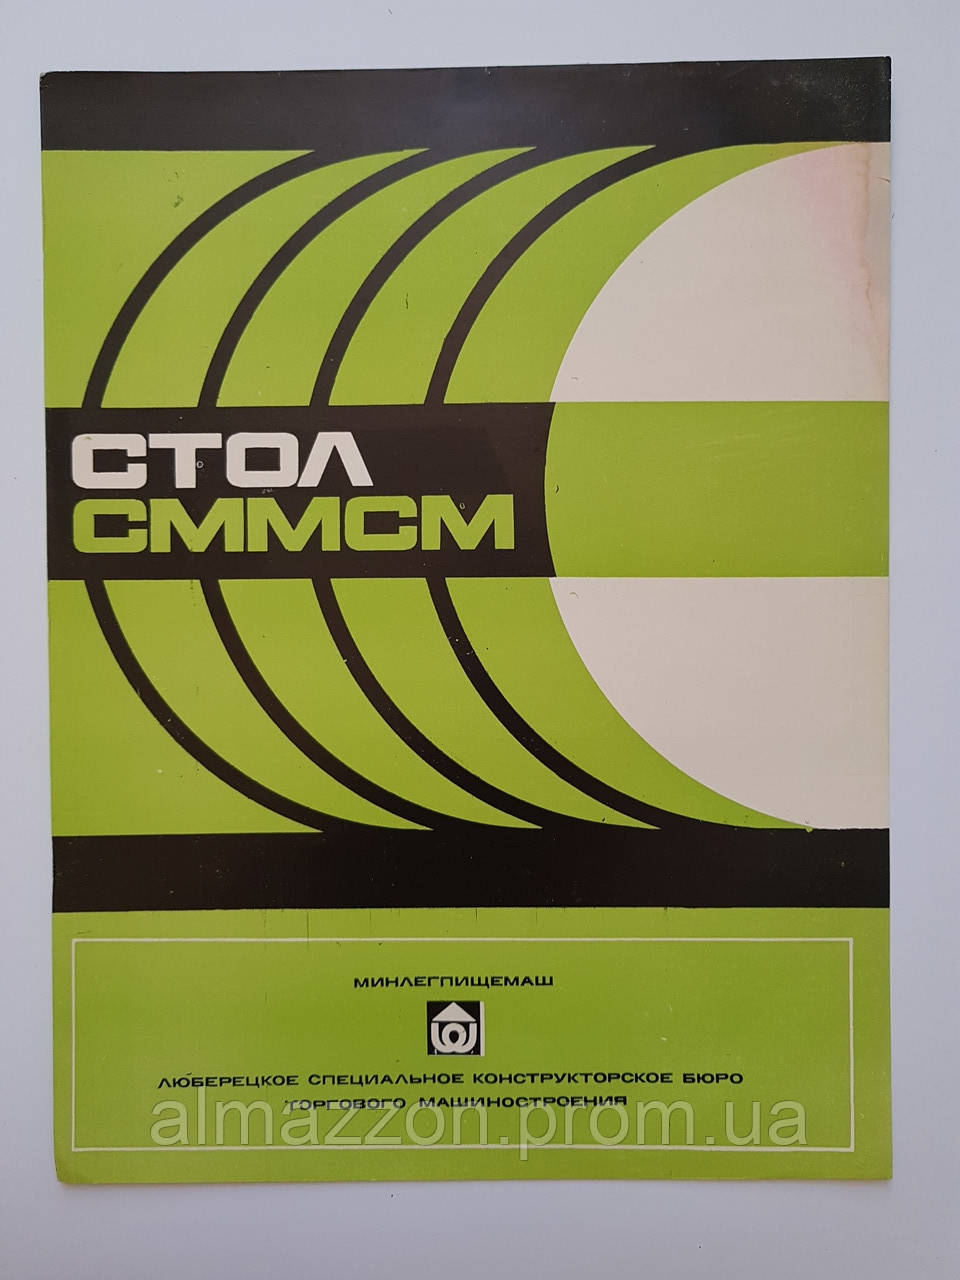 Журнал (Бюллетень) Стол СММСМ 1972г.